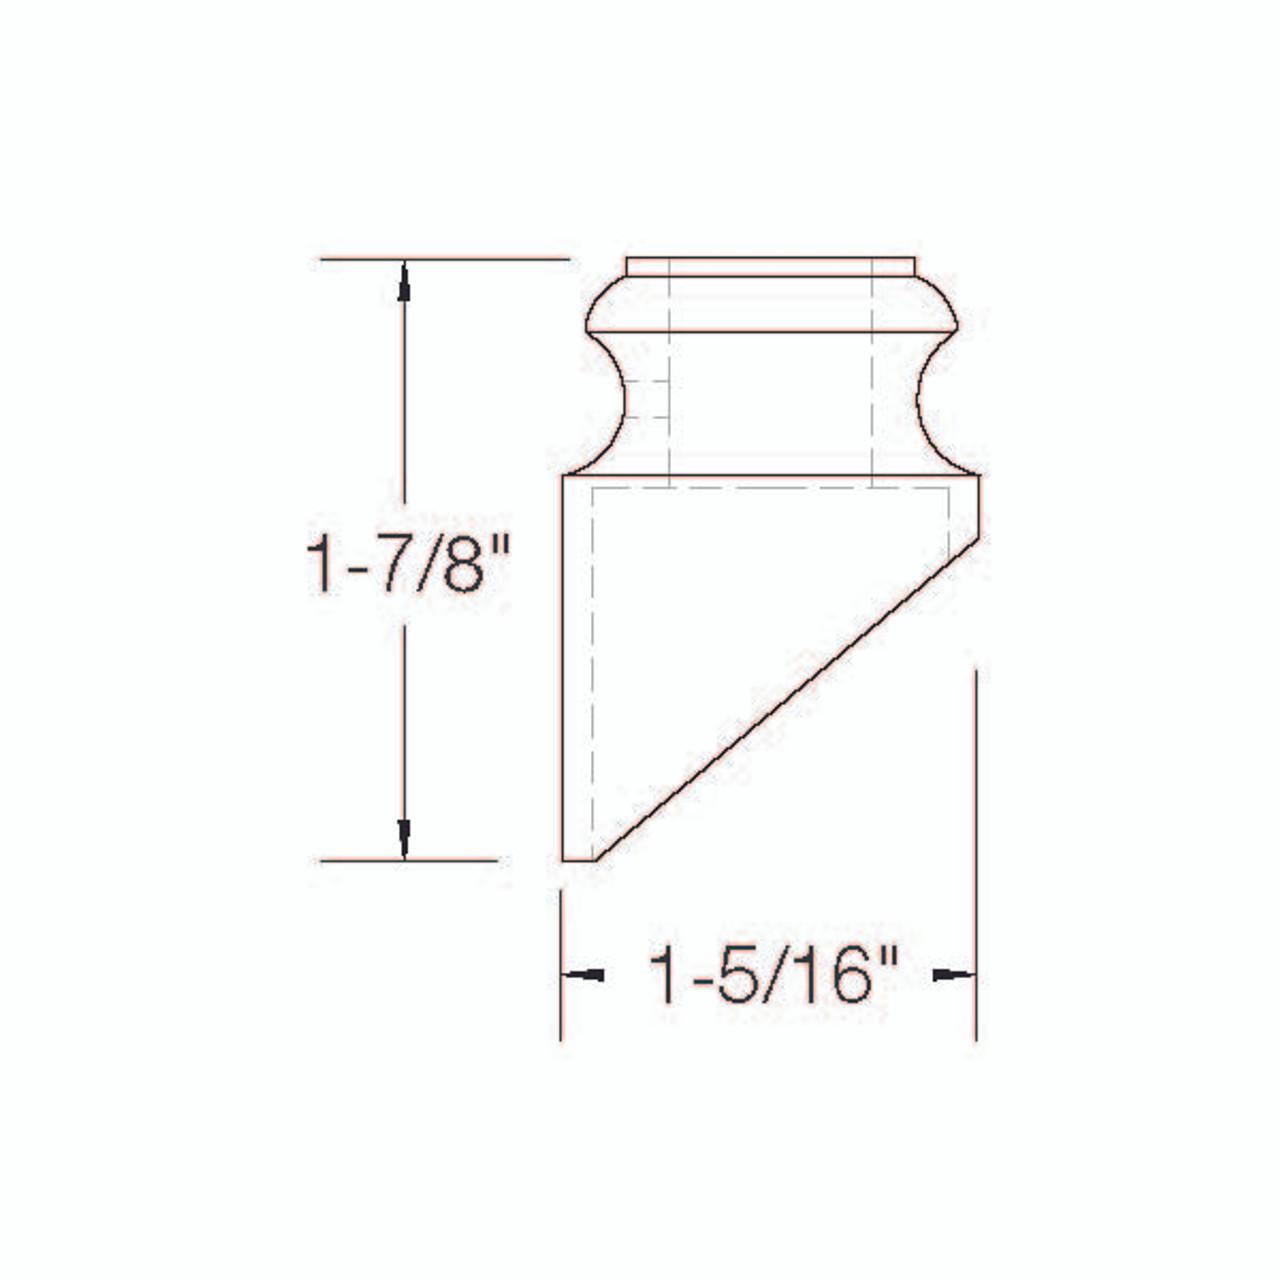 SH905 Slanted Shoe Dimensional Information